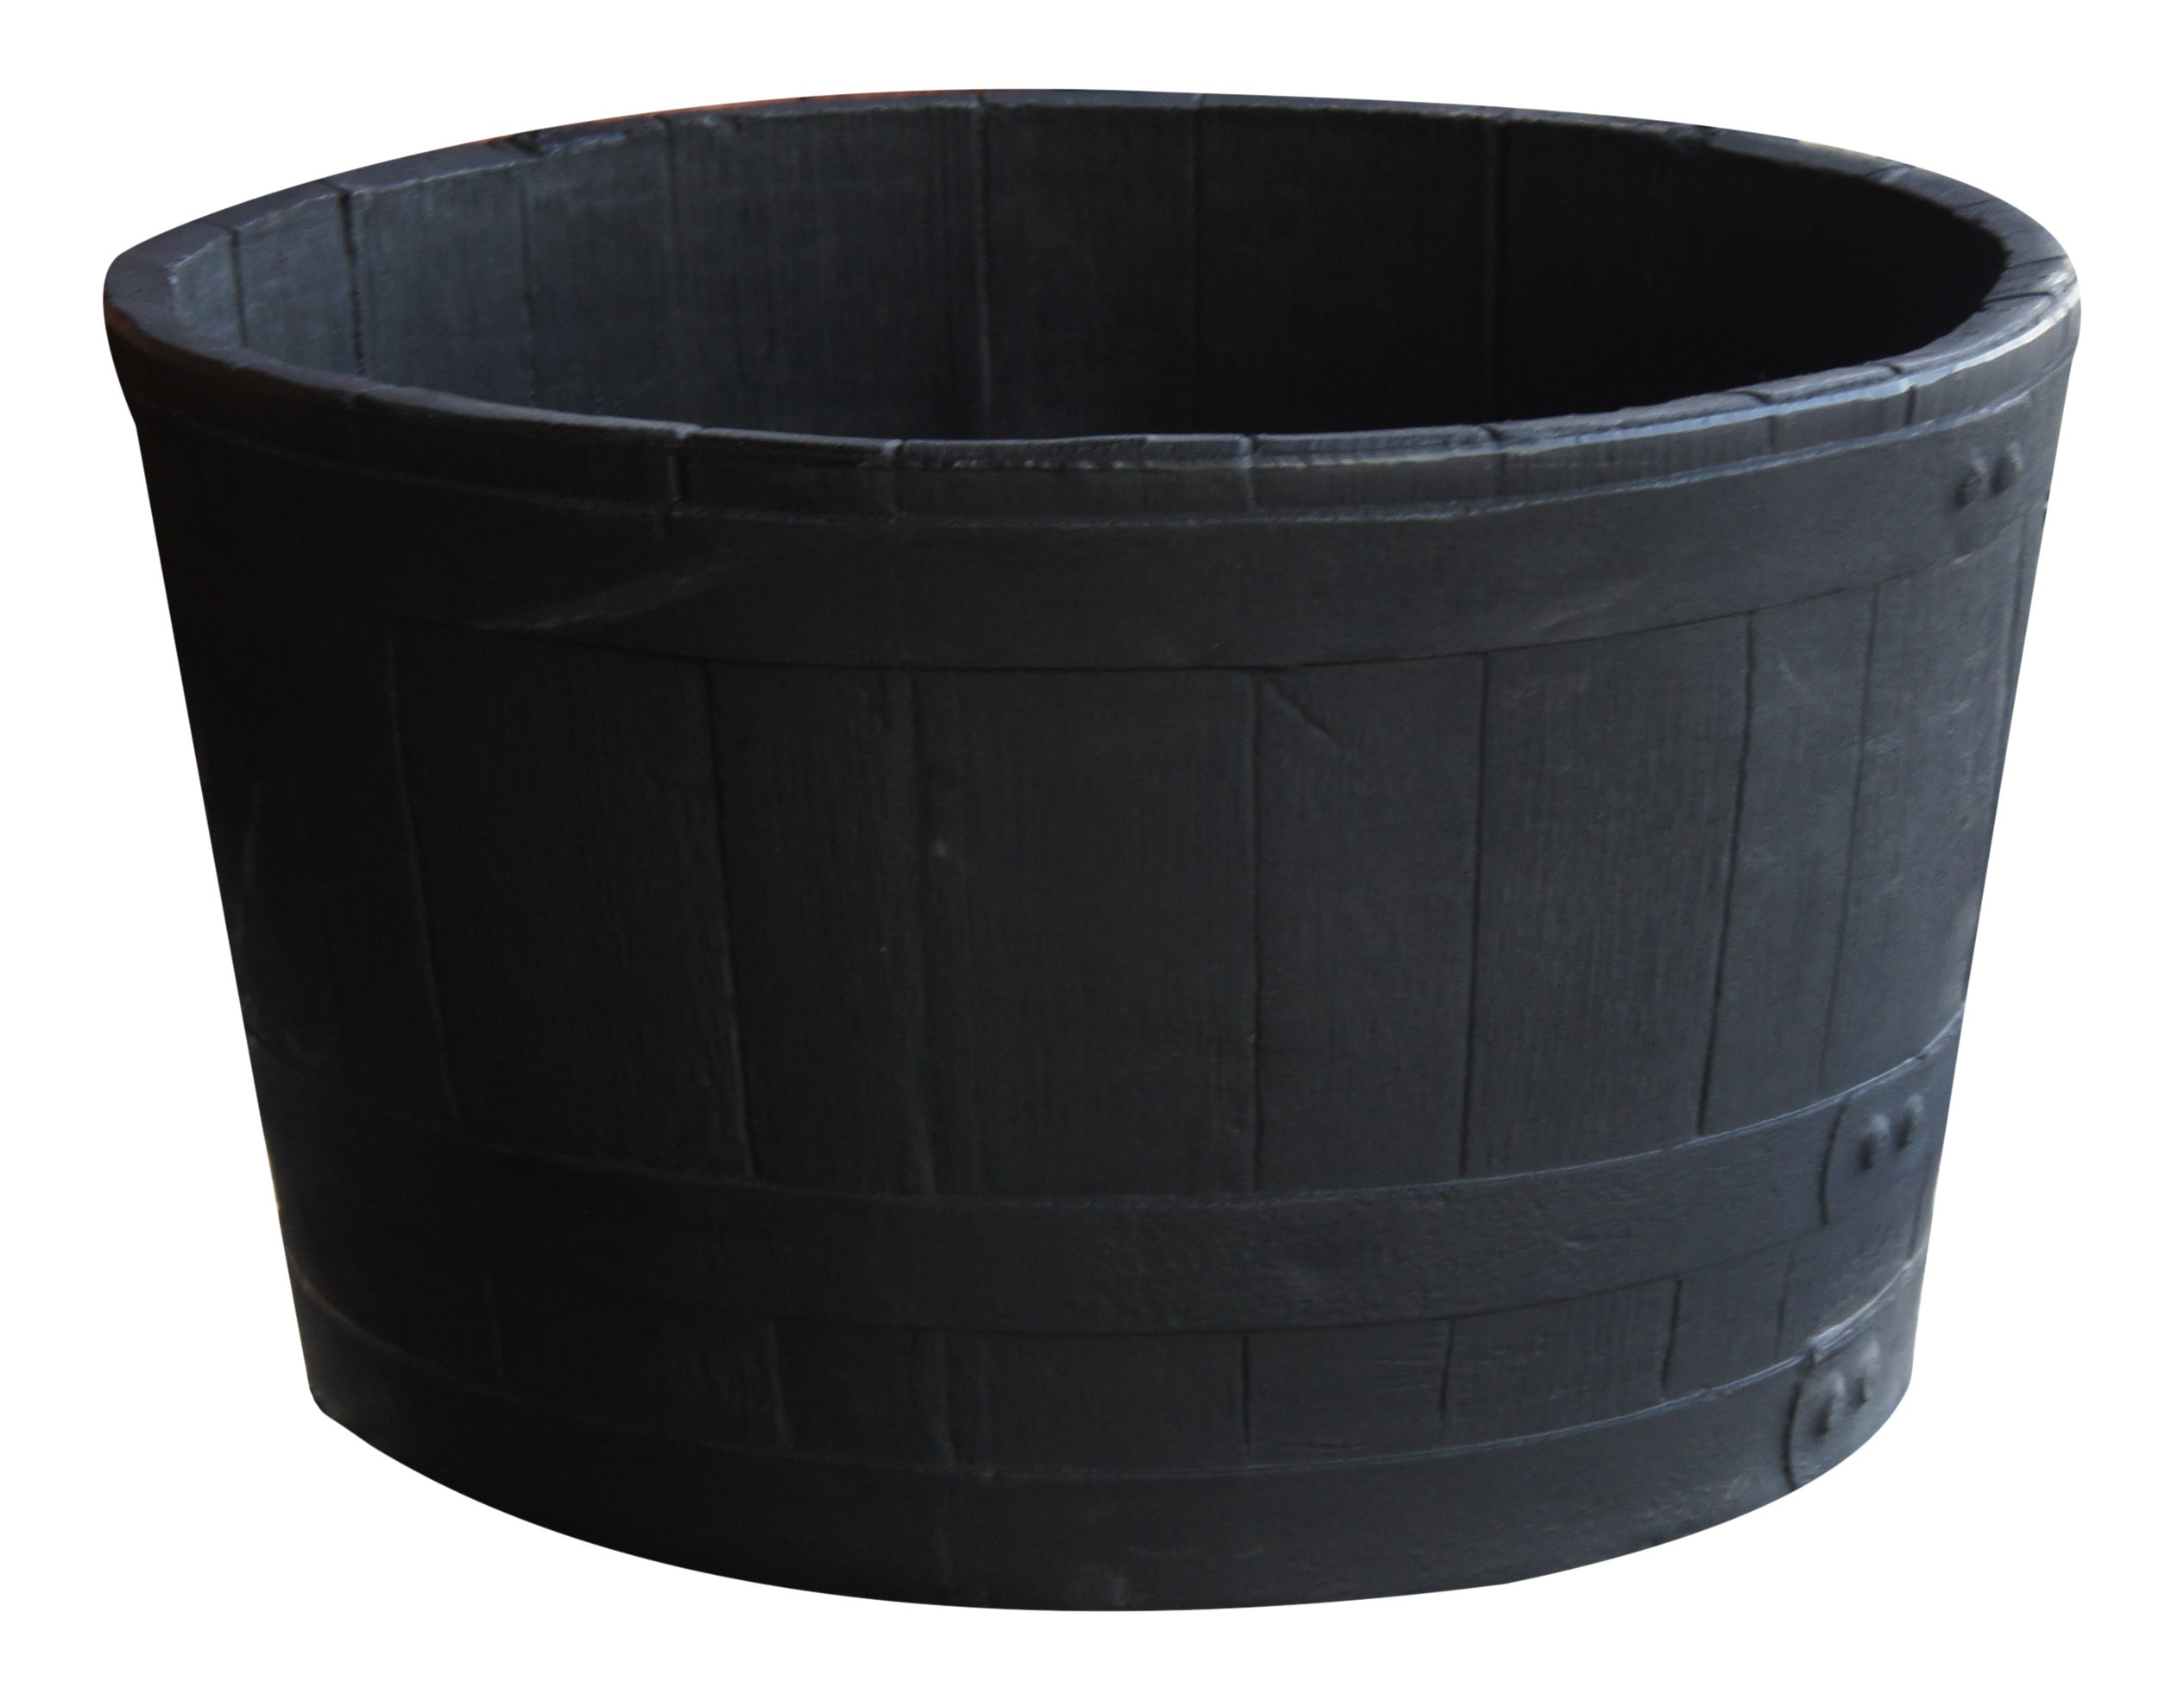 RTS Companies Inc RTS Home Accents 5600-00100F-80-81 Polyethylene Sanded Barrel Planter, Black